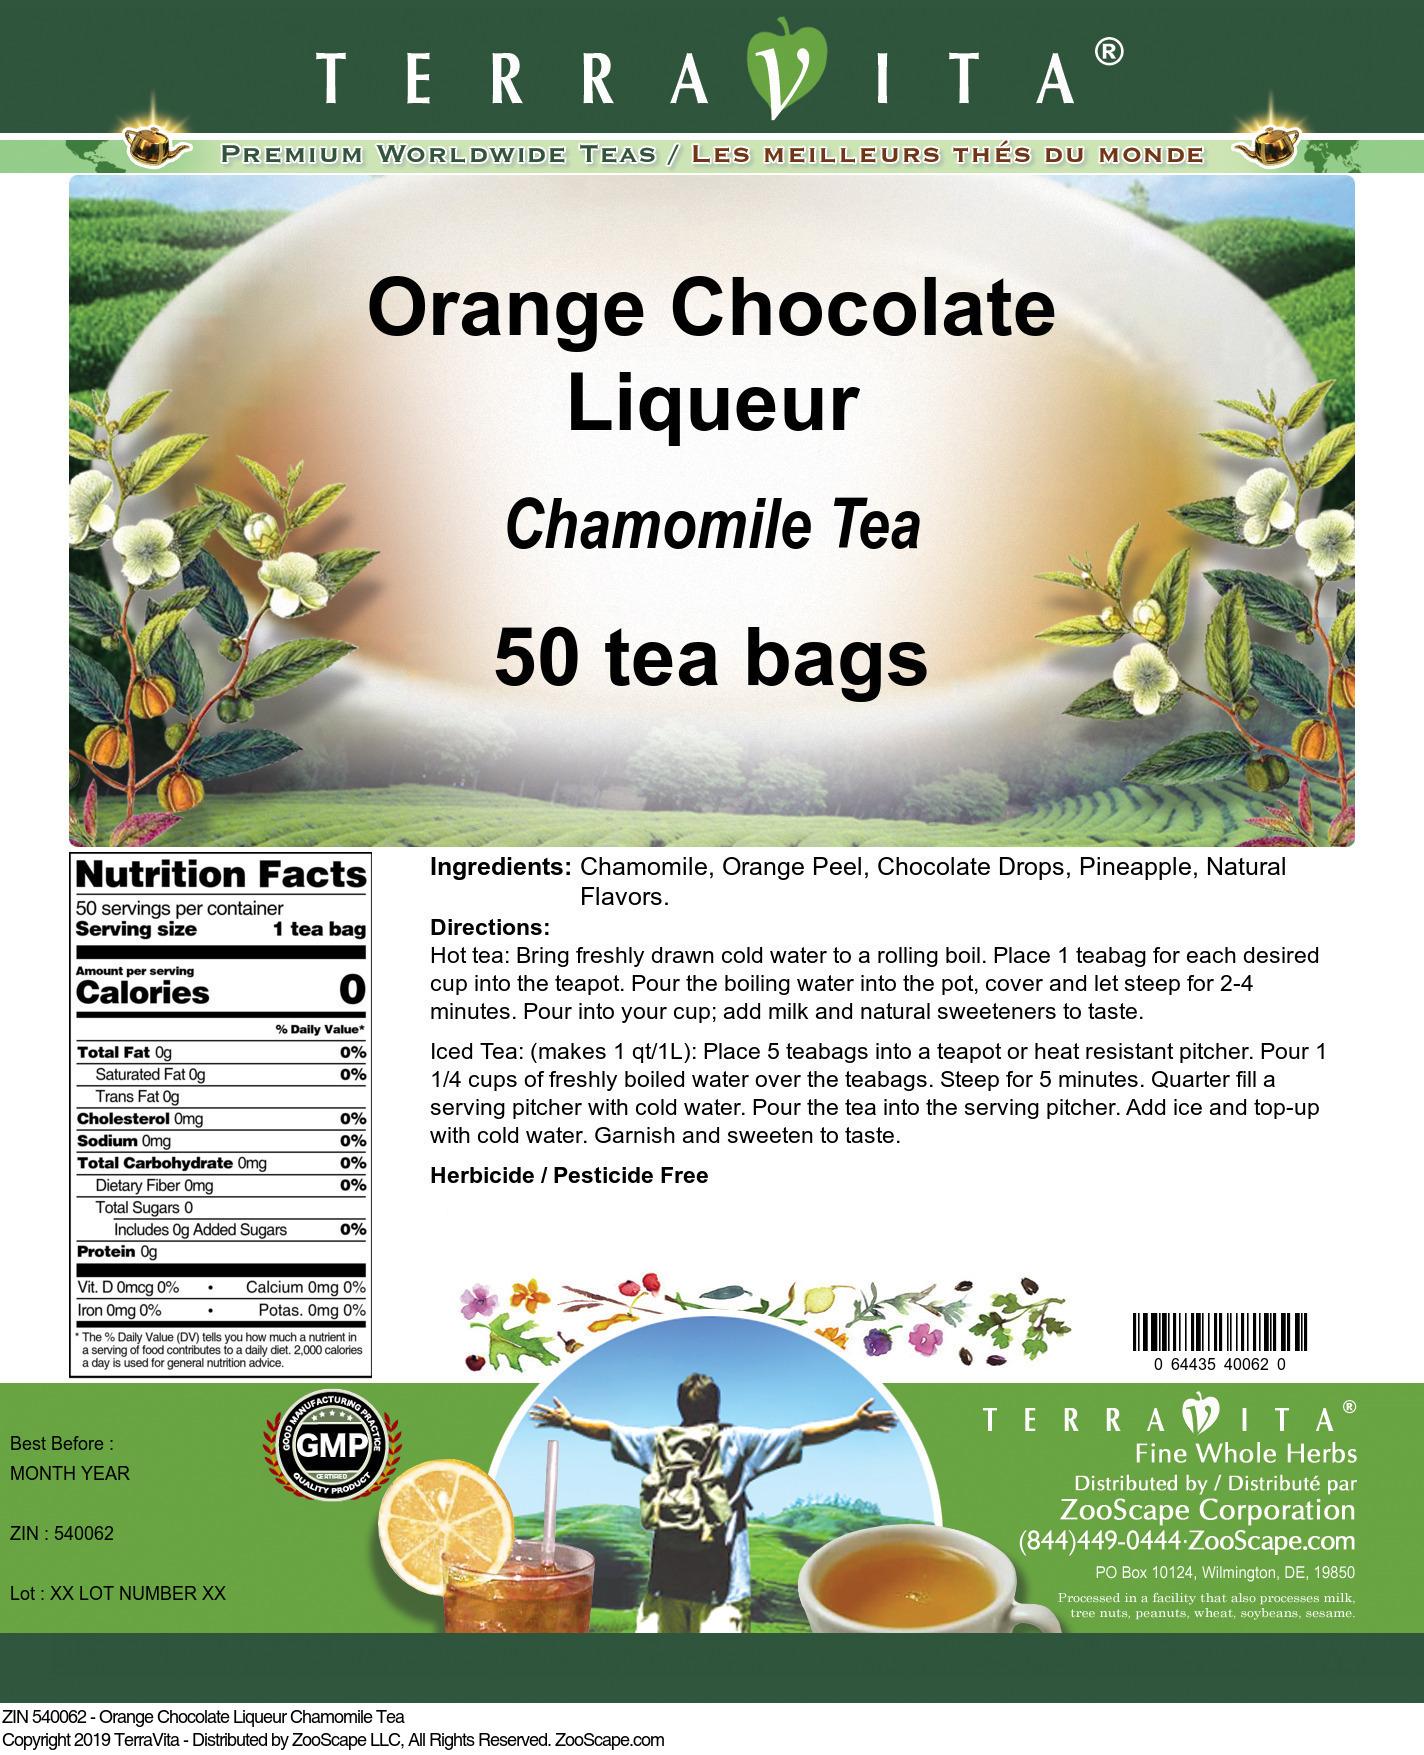 Orange Chocolate Liqueur Chamomile Tea